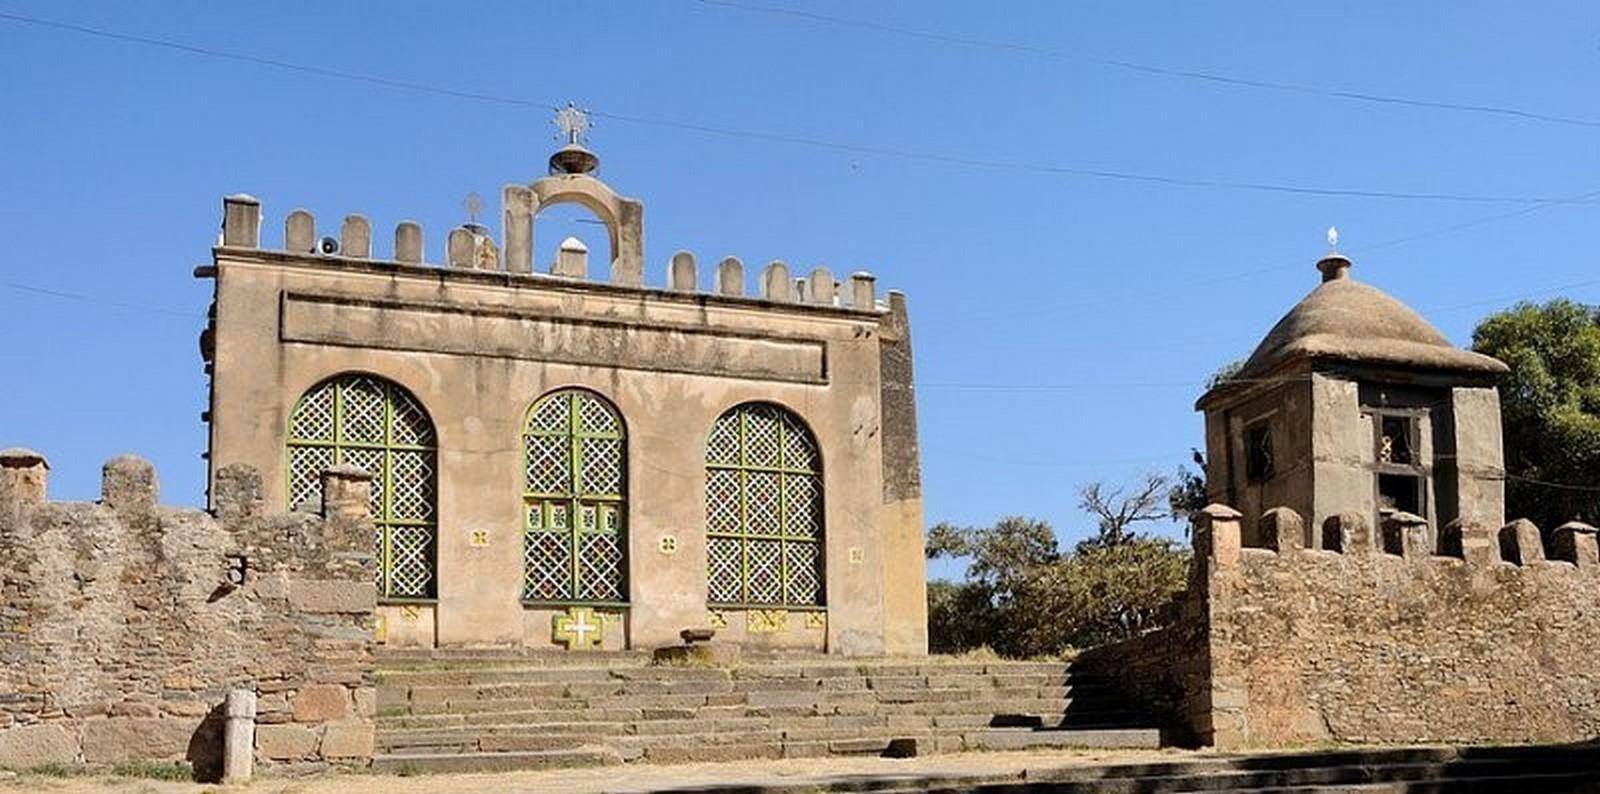 Aksumite architecture: Architecture of Ethiopia - Sheet16